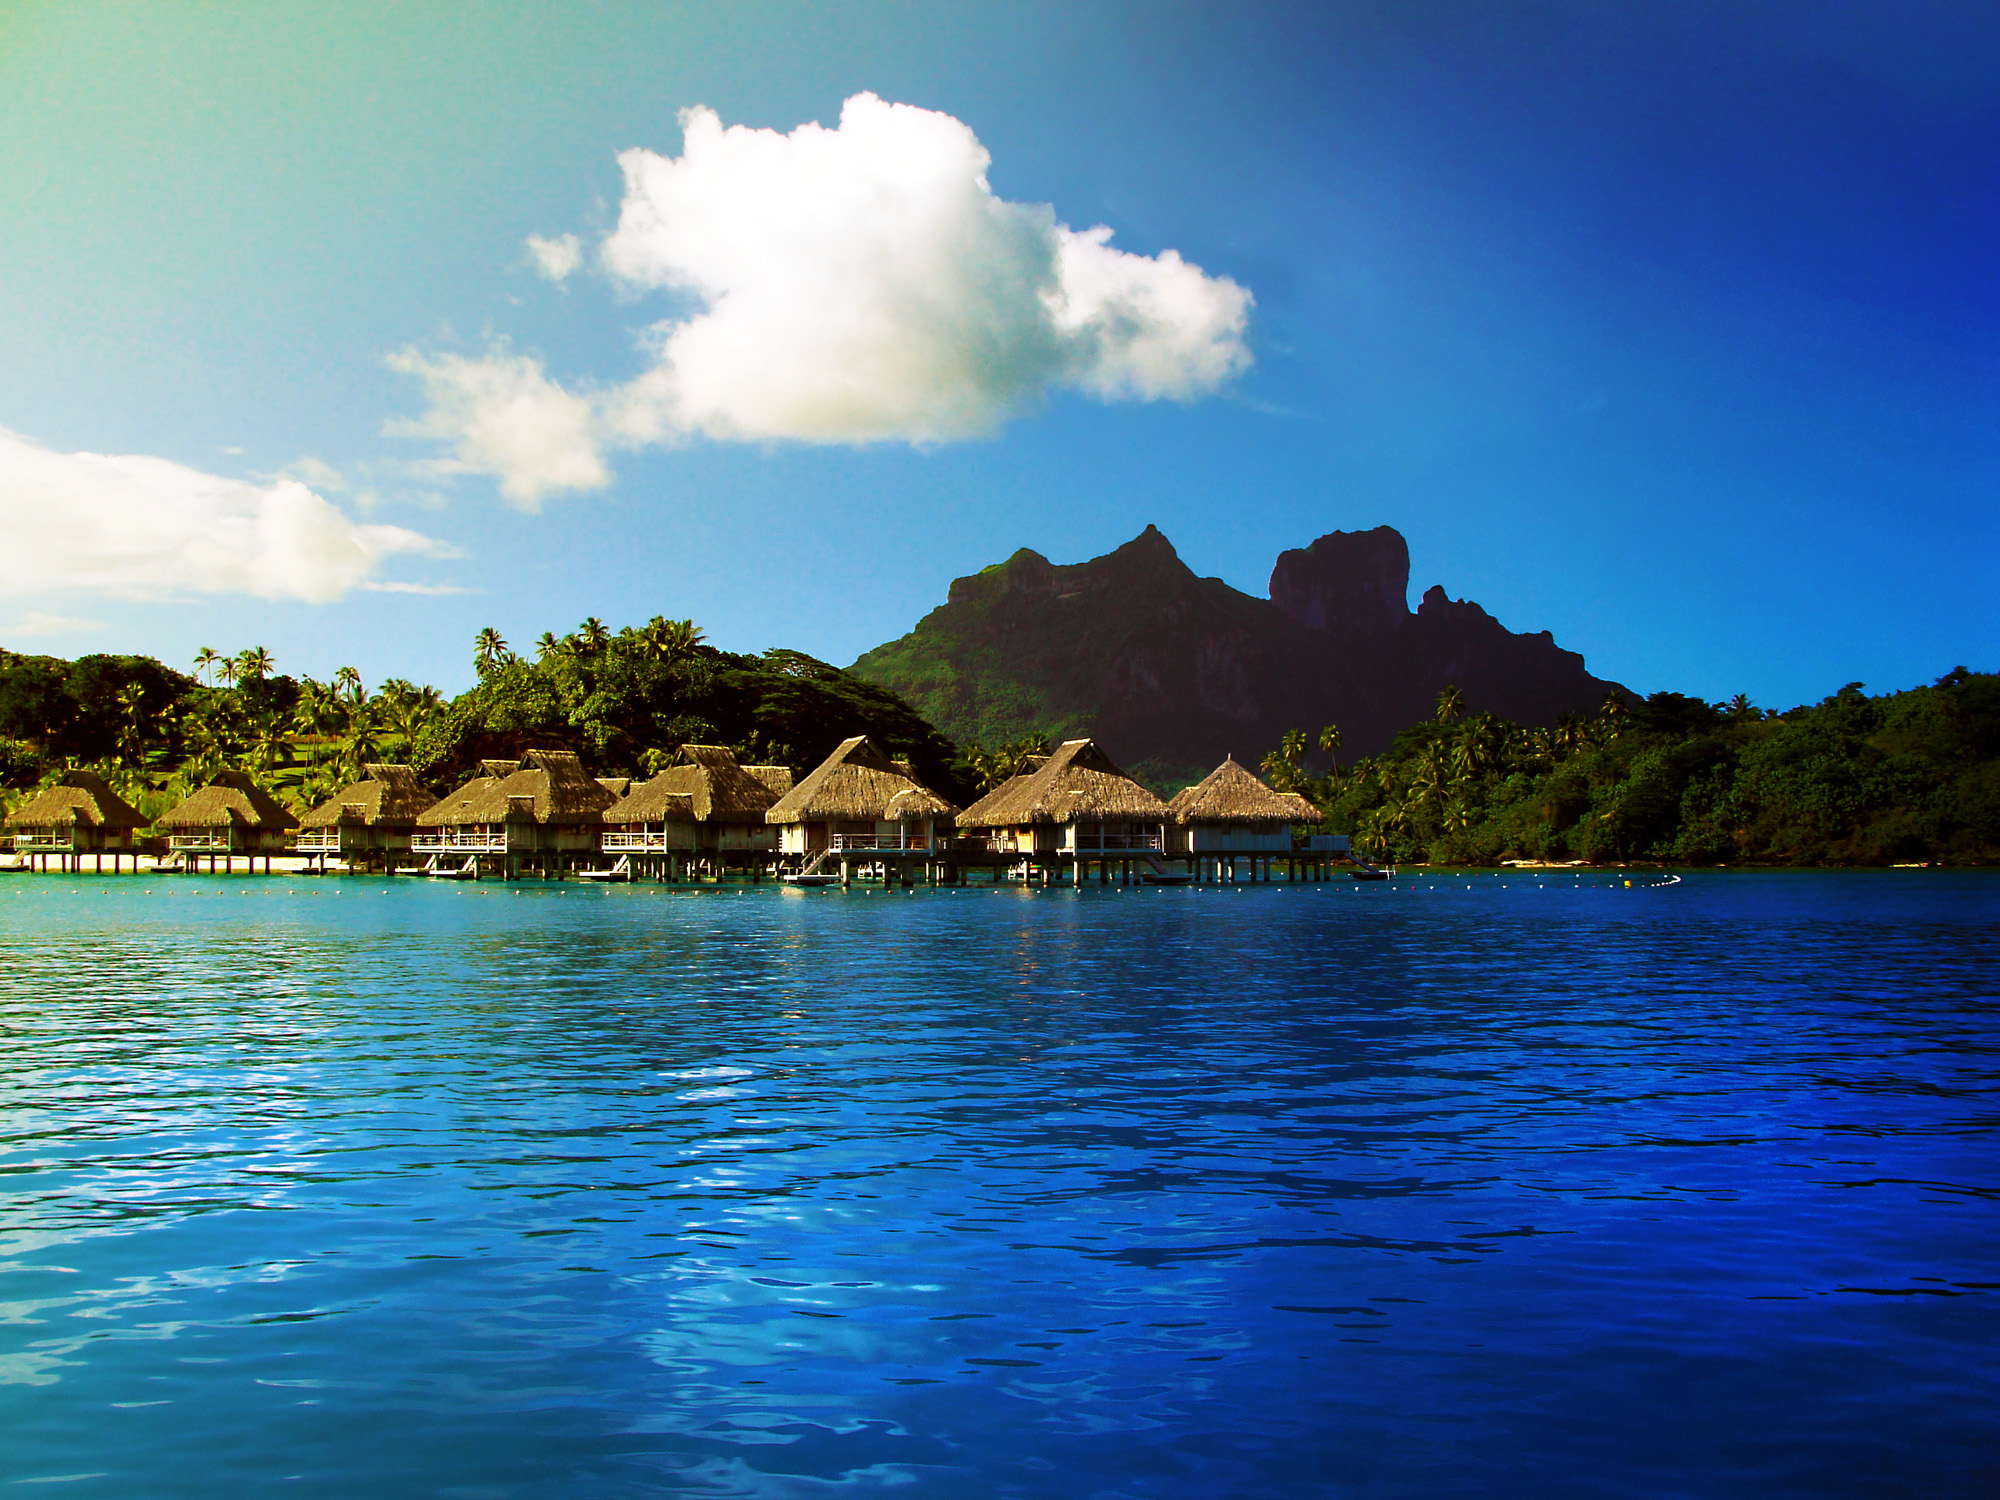 Hd Wallpaper Pictures Bora Bora French Polynesia Amazing Funny